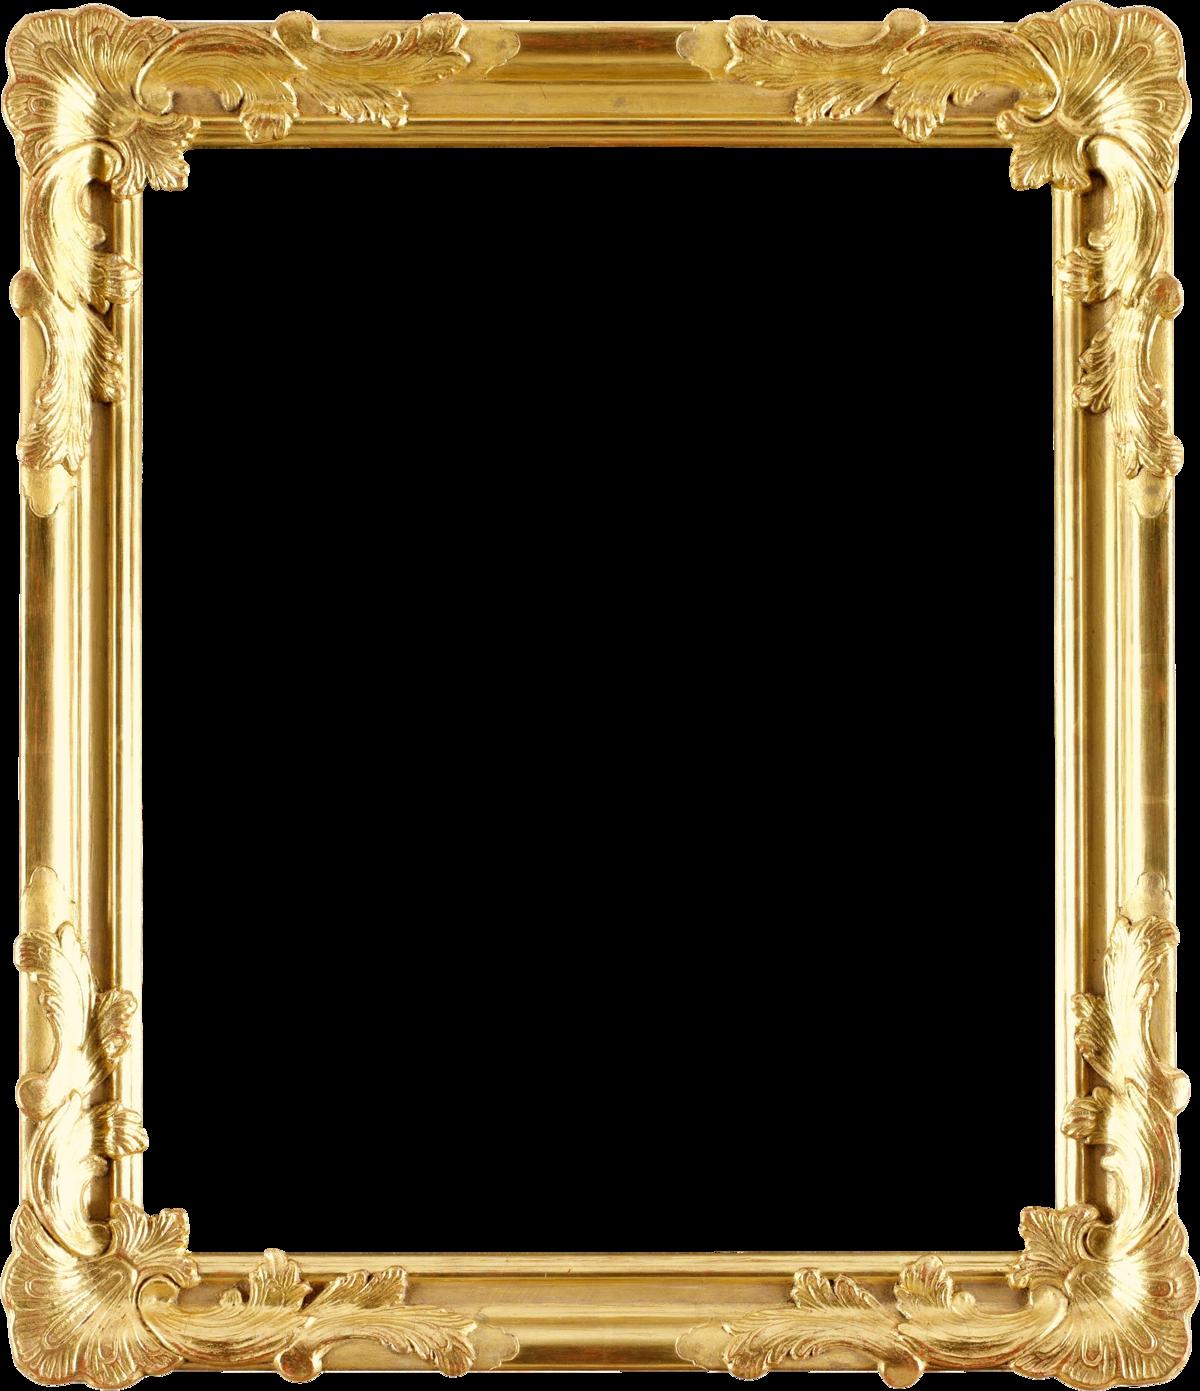 фанаты картинки без фона для рамок активно